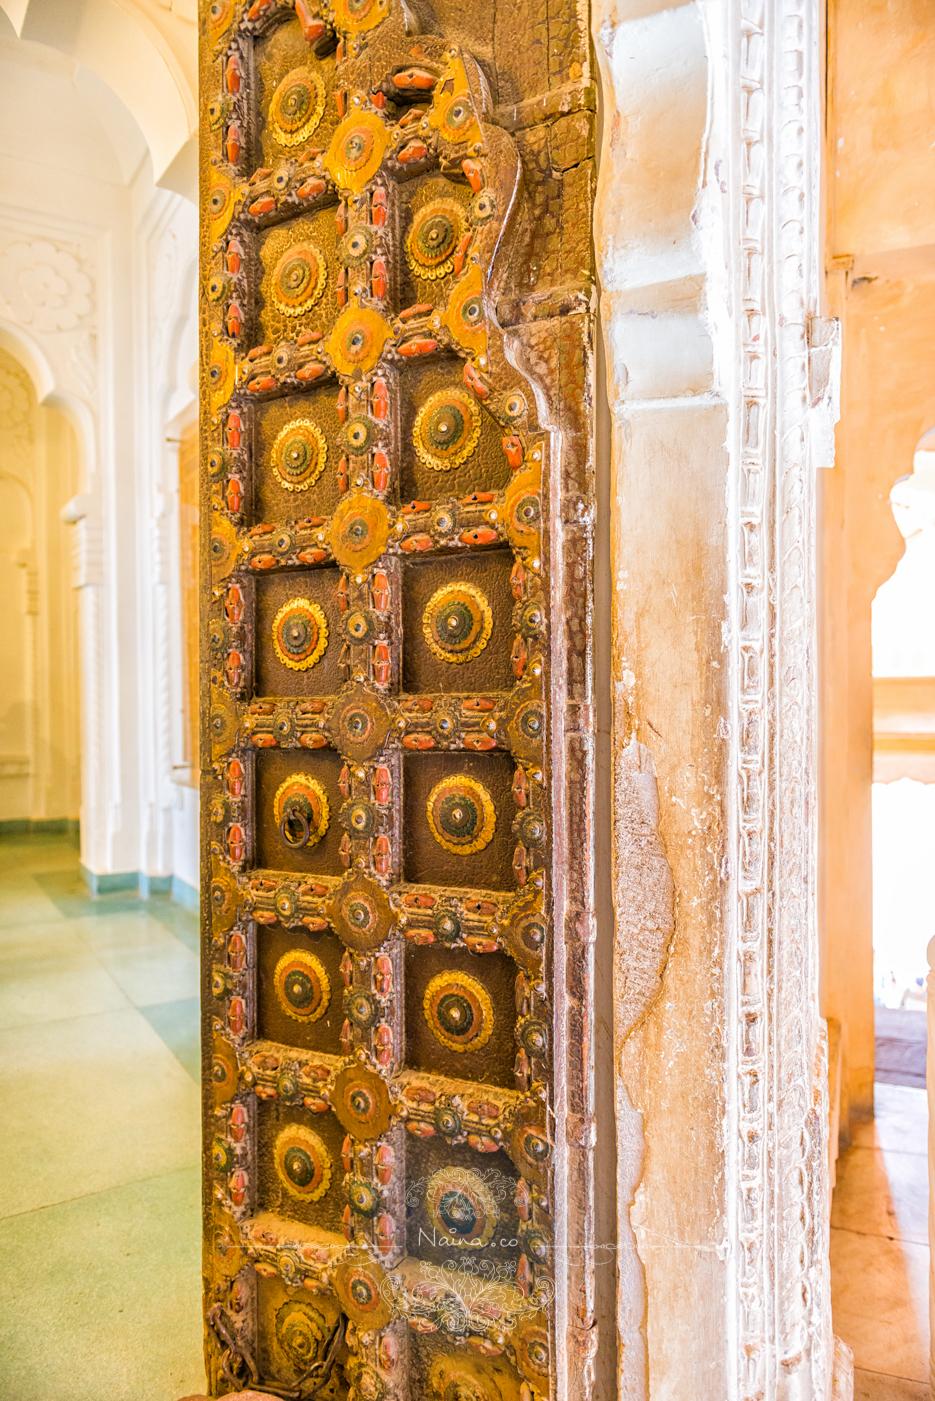 Royal Salute Maharaja of Jodhpur Diamond Jubilee Cup, Meherangarh Fort, Rajasthan, photographed by Lifestyle photographer, blogger Naina Redhu of Naina.co